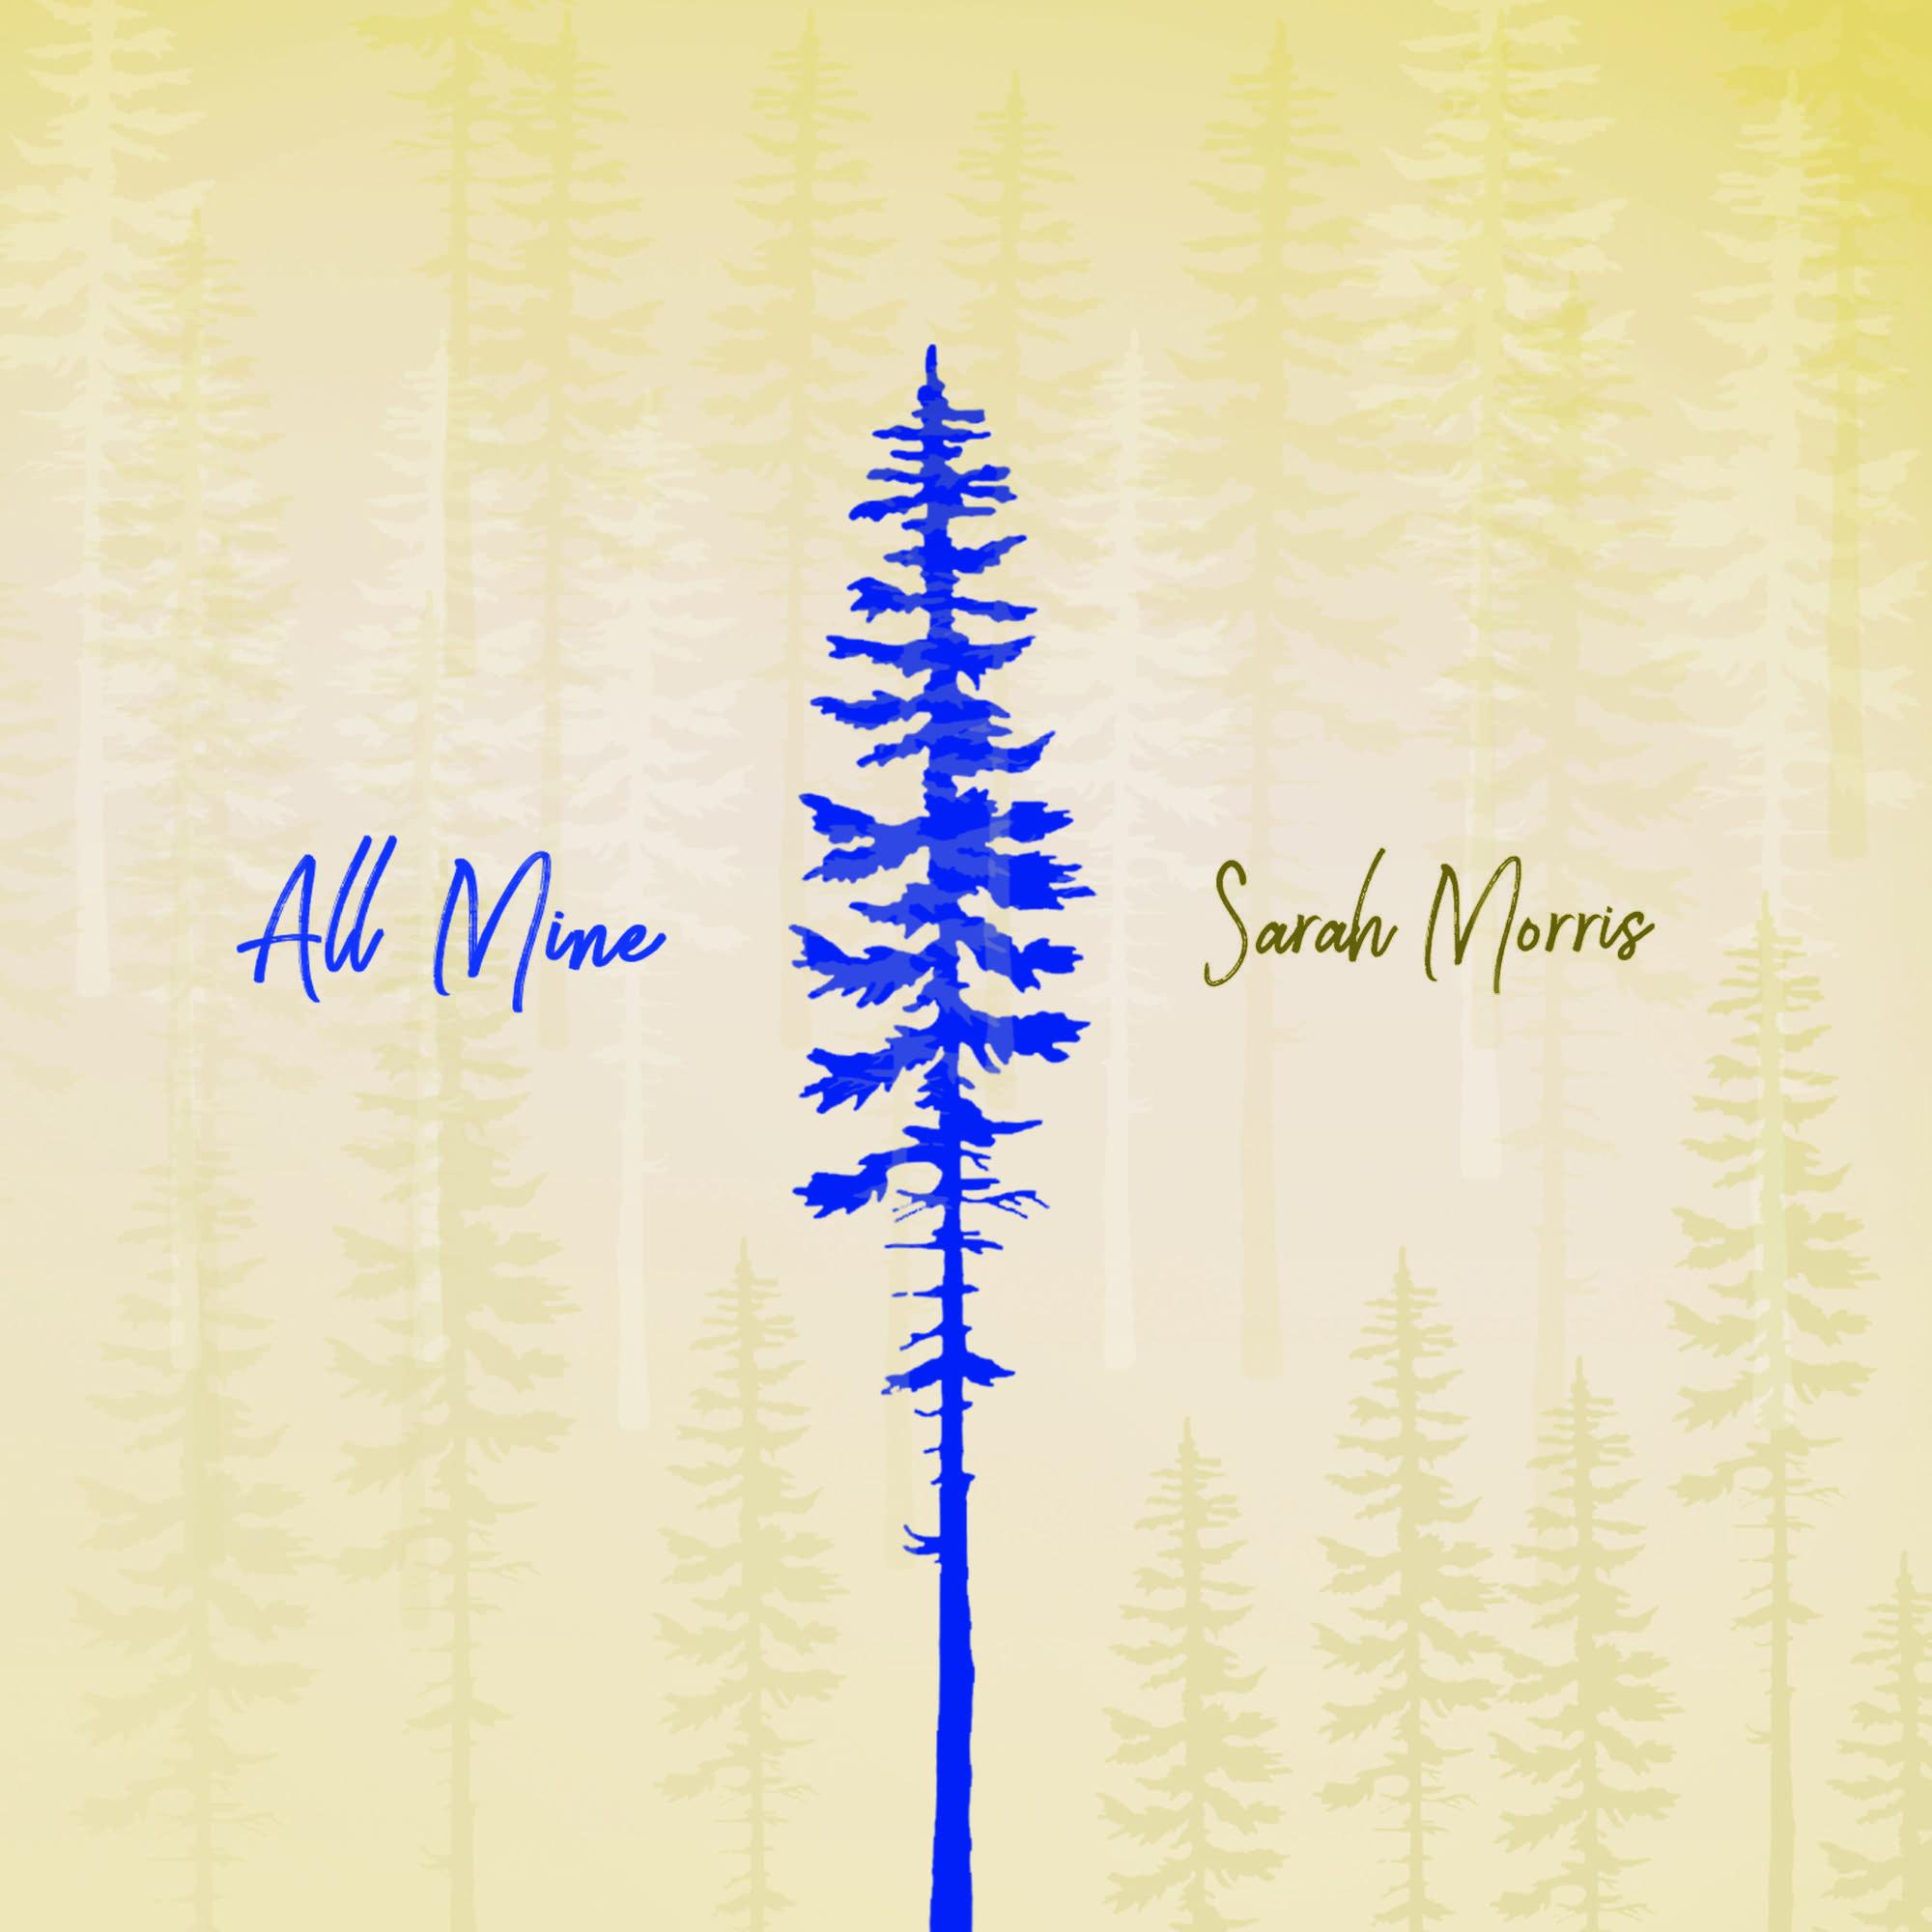 Sarah Morris, 'All Mine'